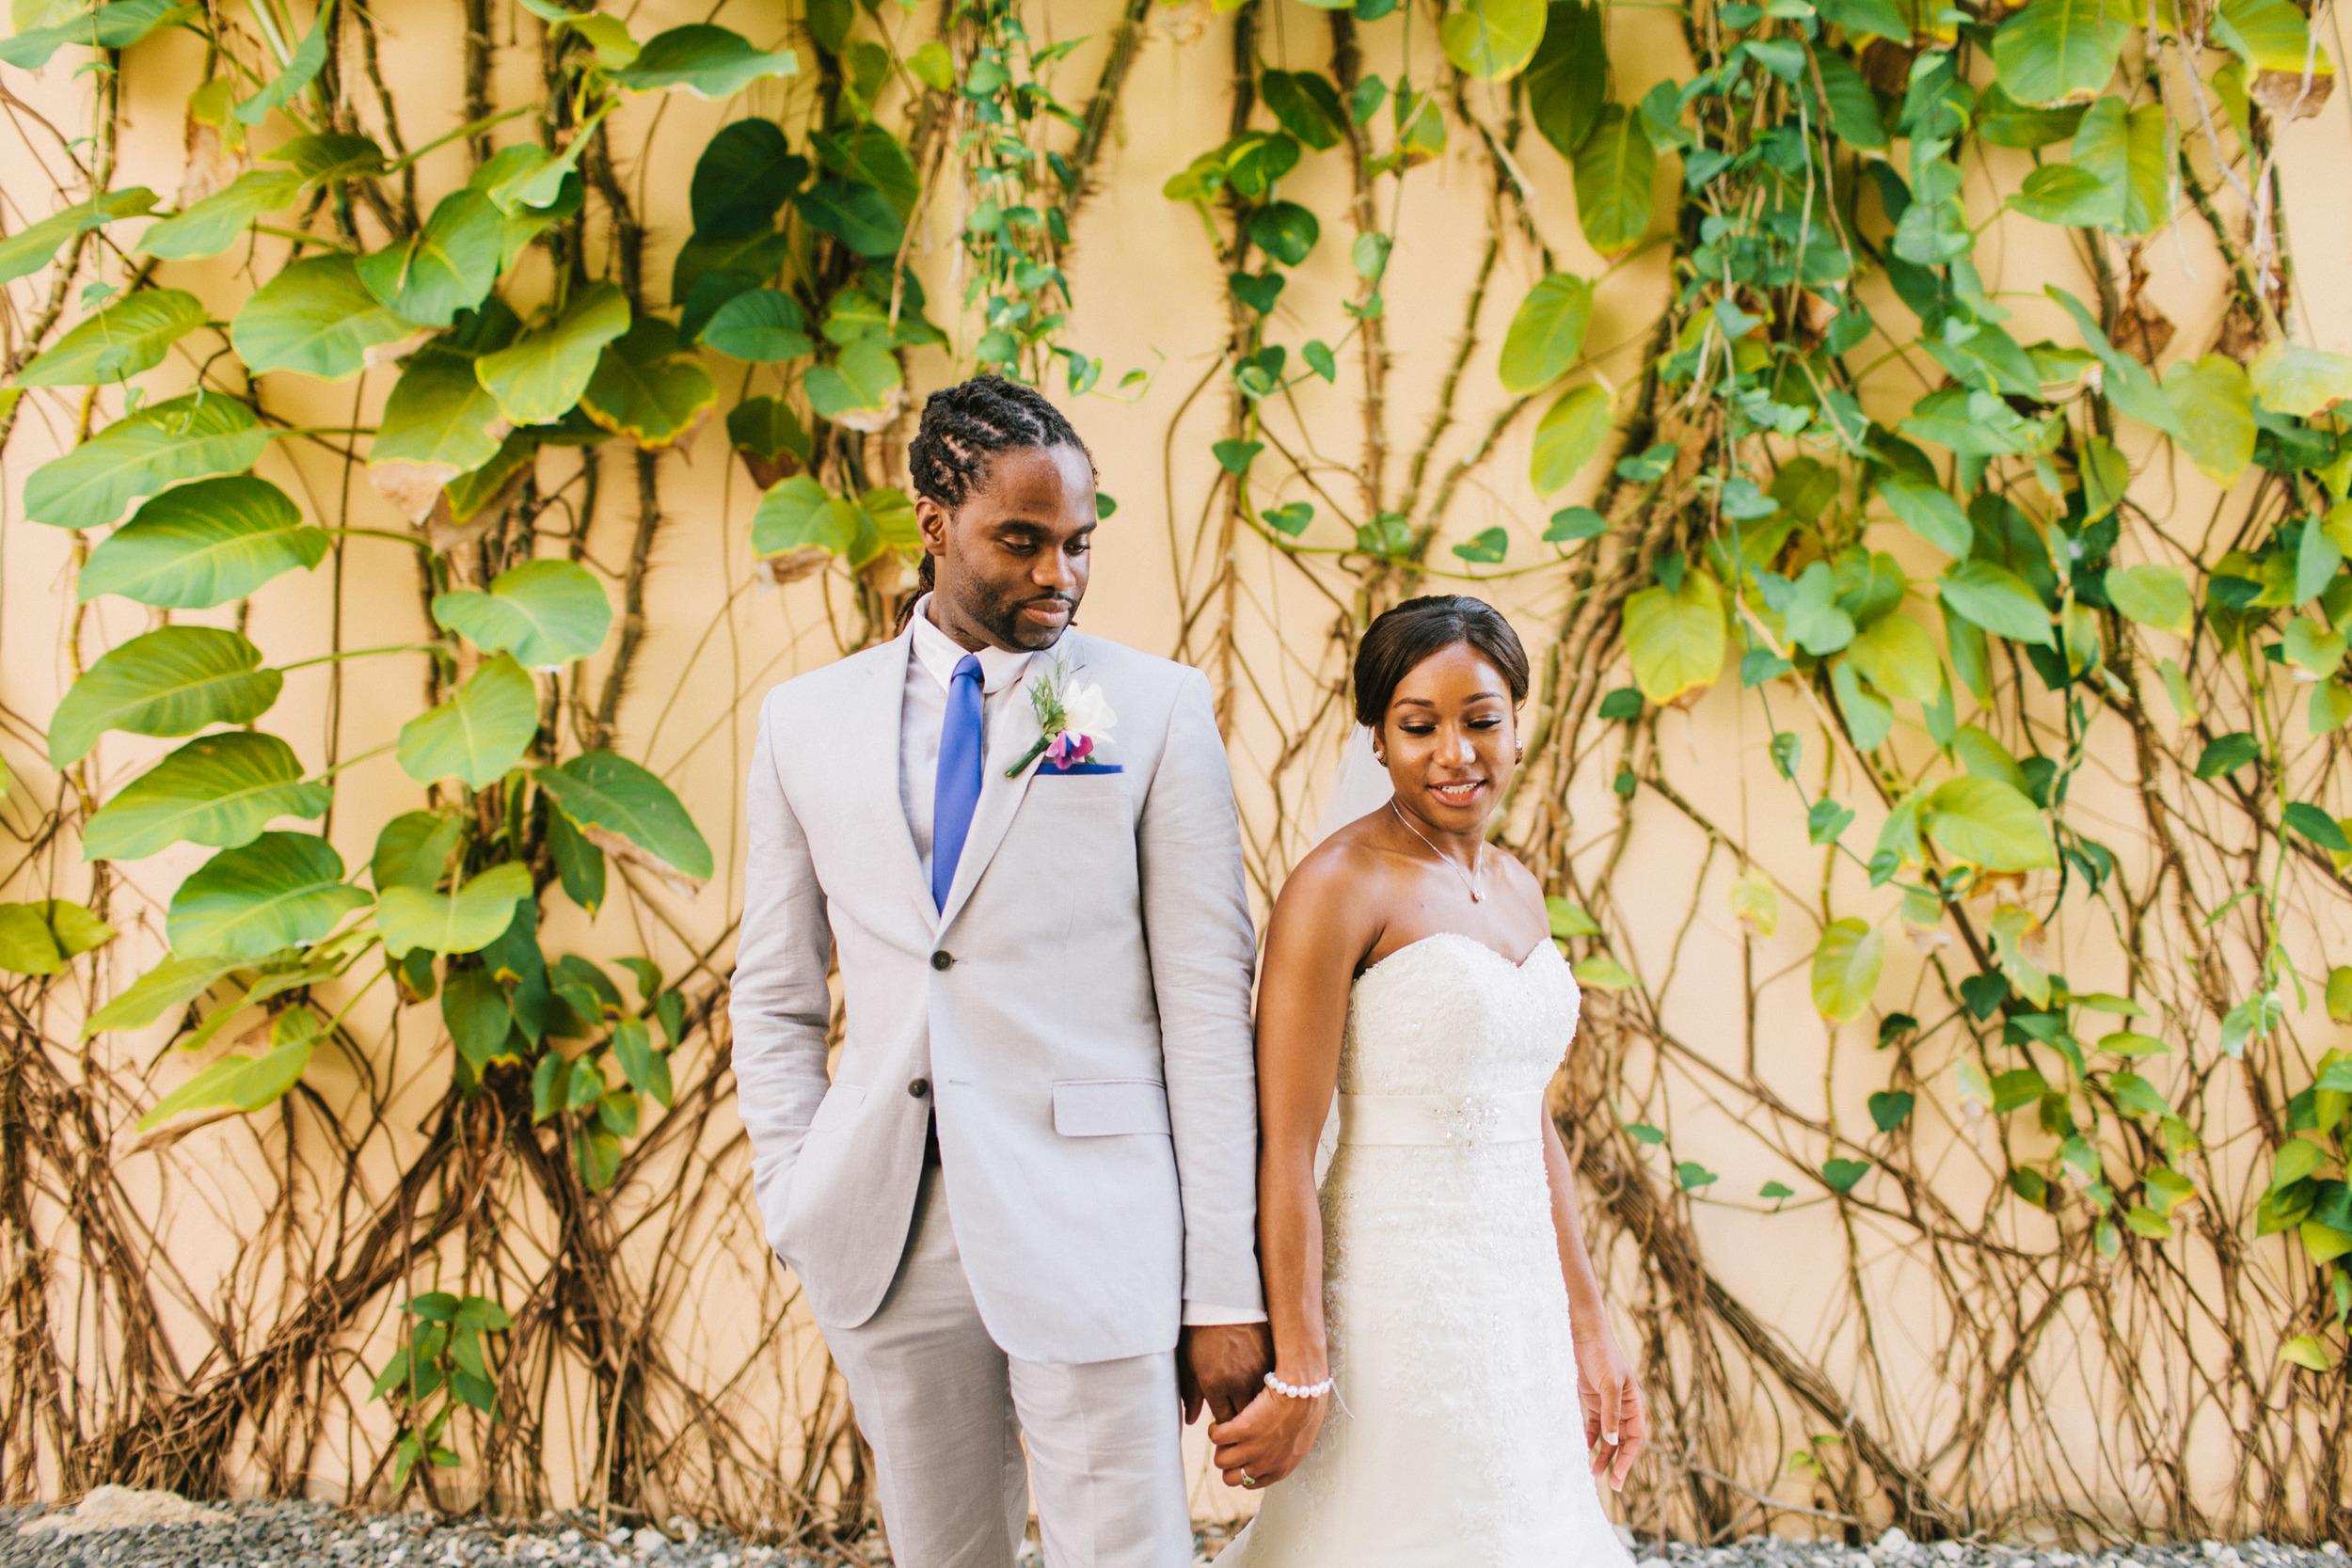 michael-rousseau-photography-dominican-republic-destination-wedding-cara-jason-colonial-majestic-dominican-republic097.jpg